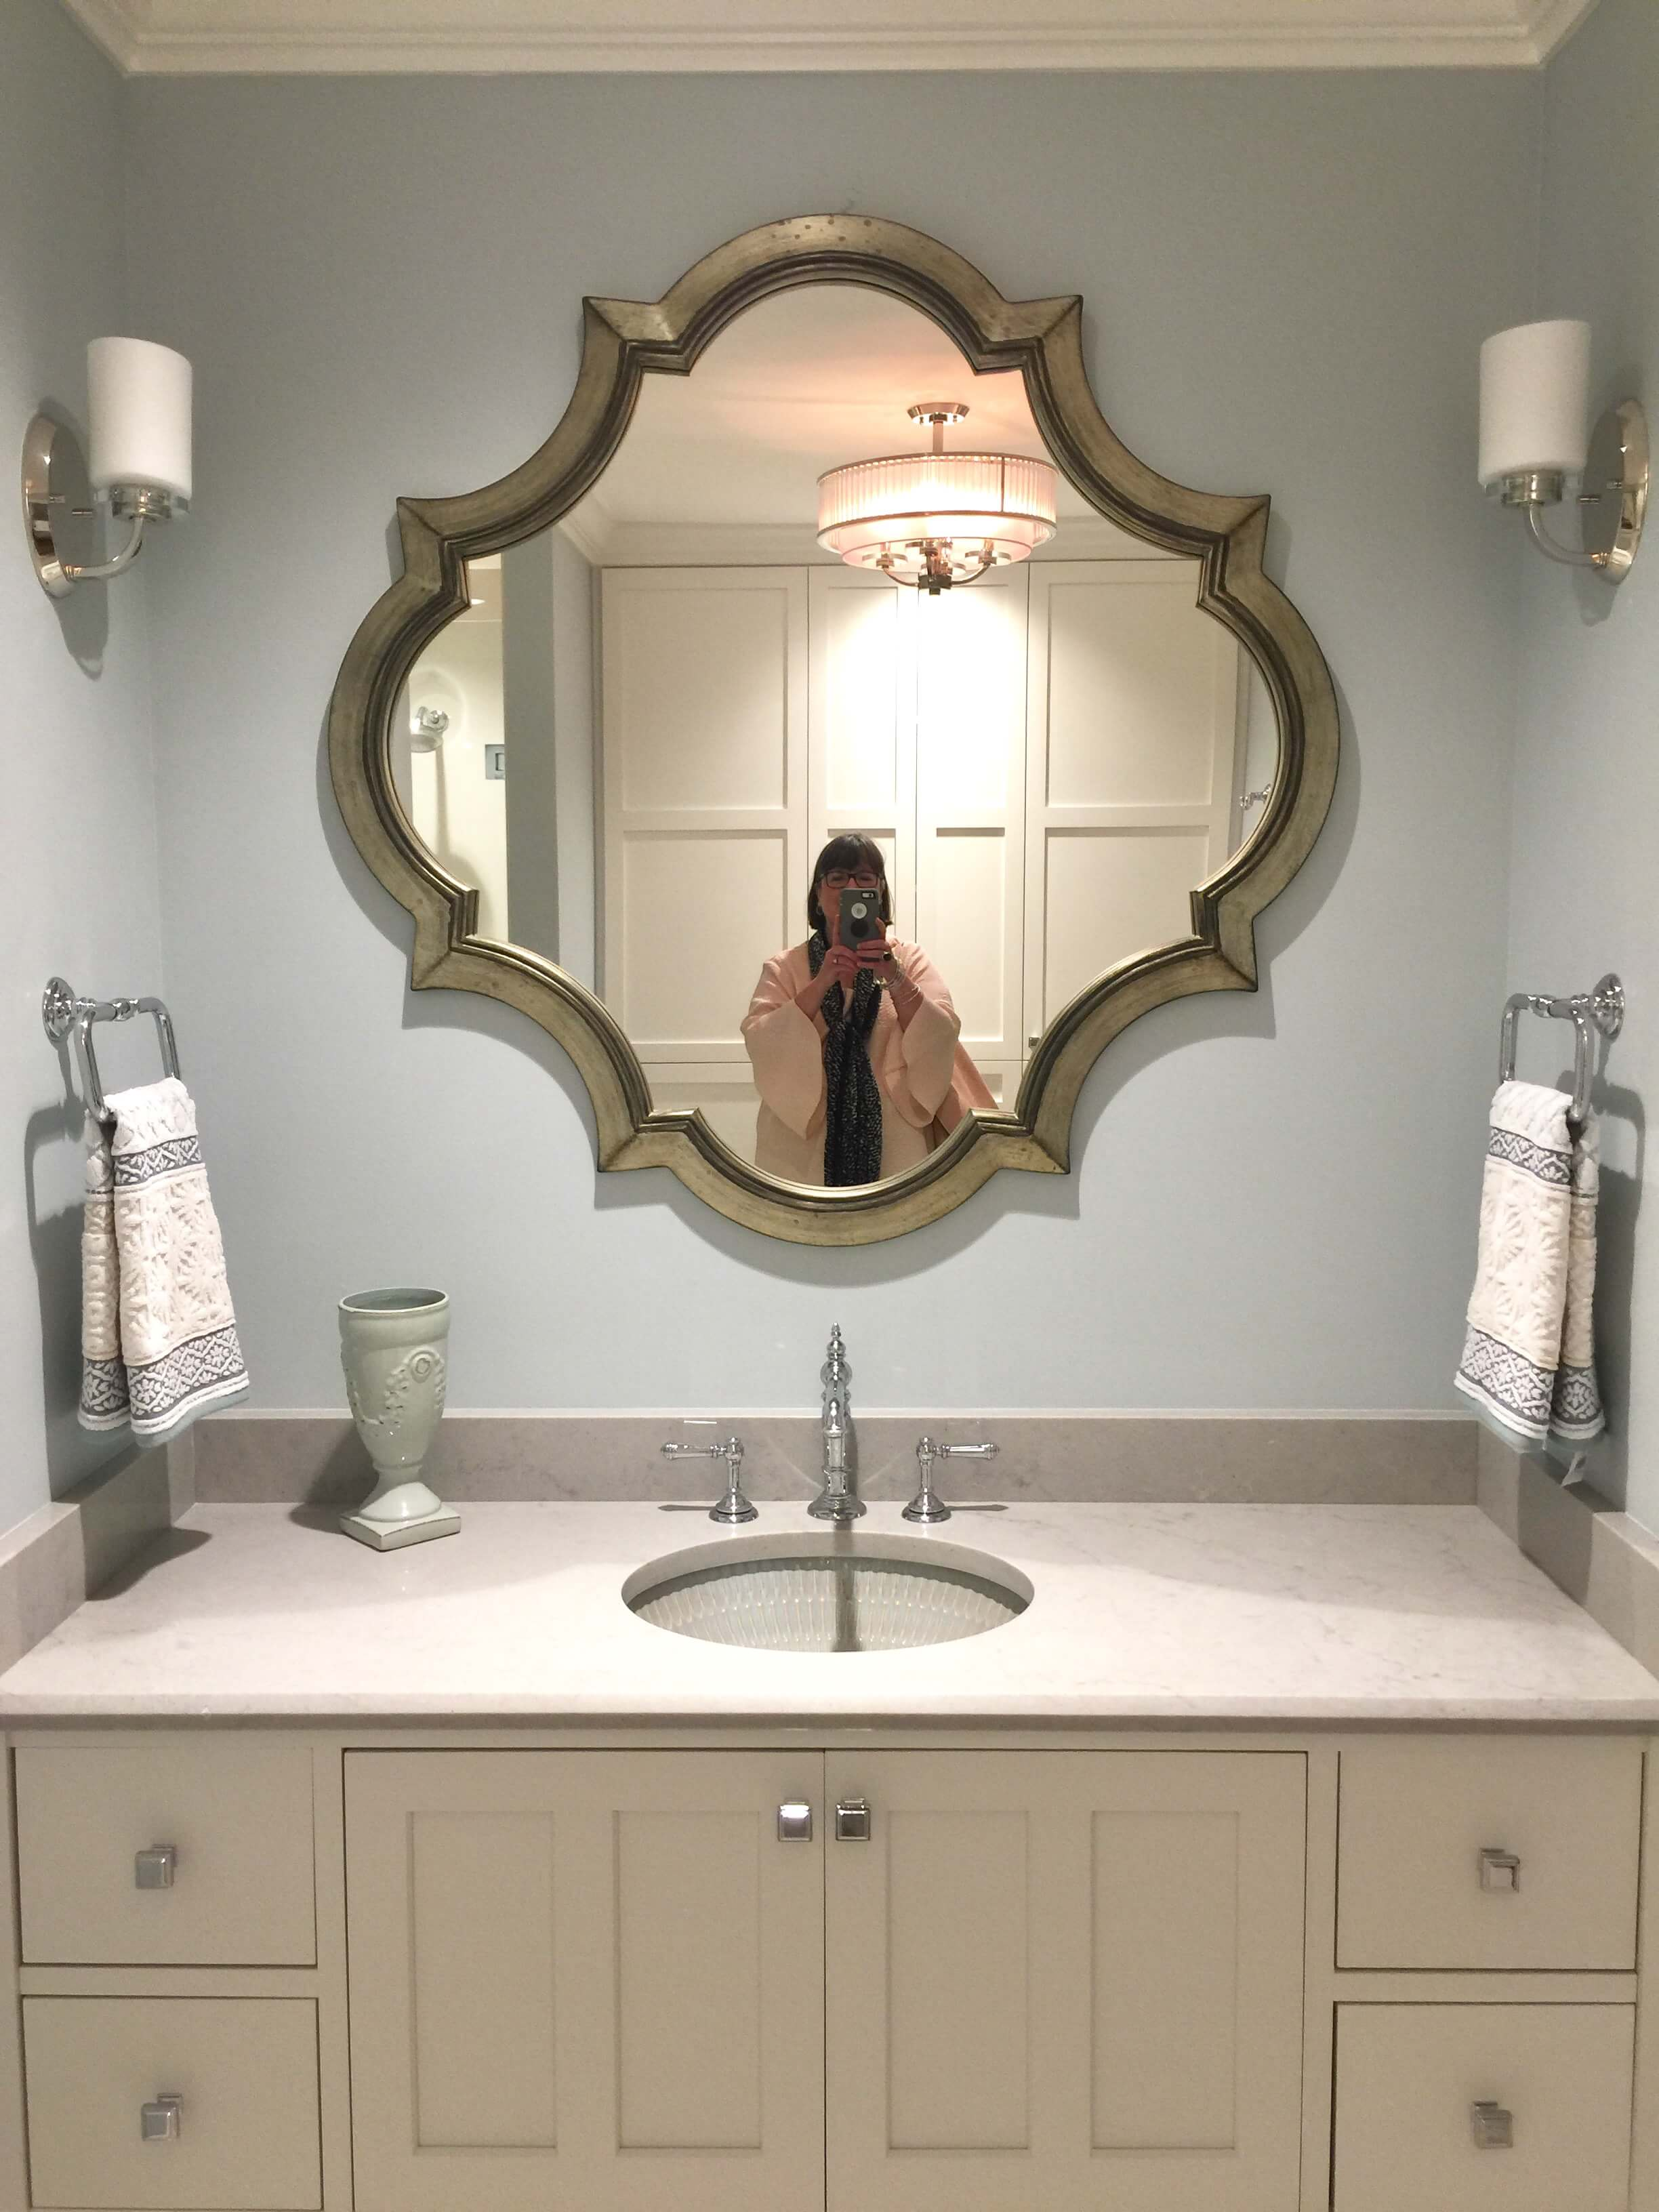 Guest bathroom - The New American Remodel - Orlando, KBIS2018 #bathroomvanity #mirror